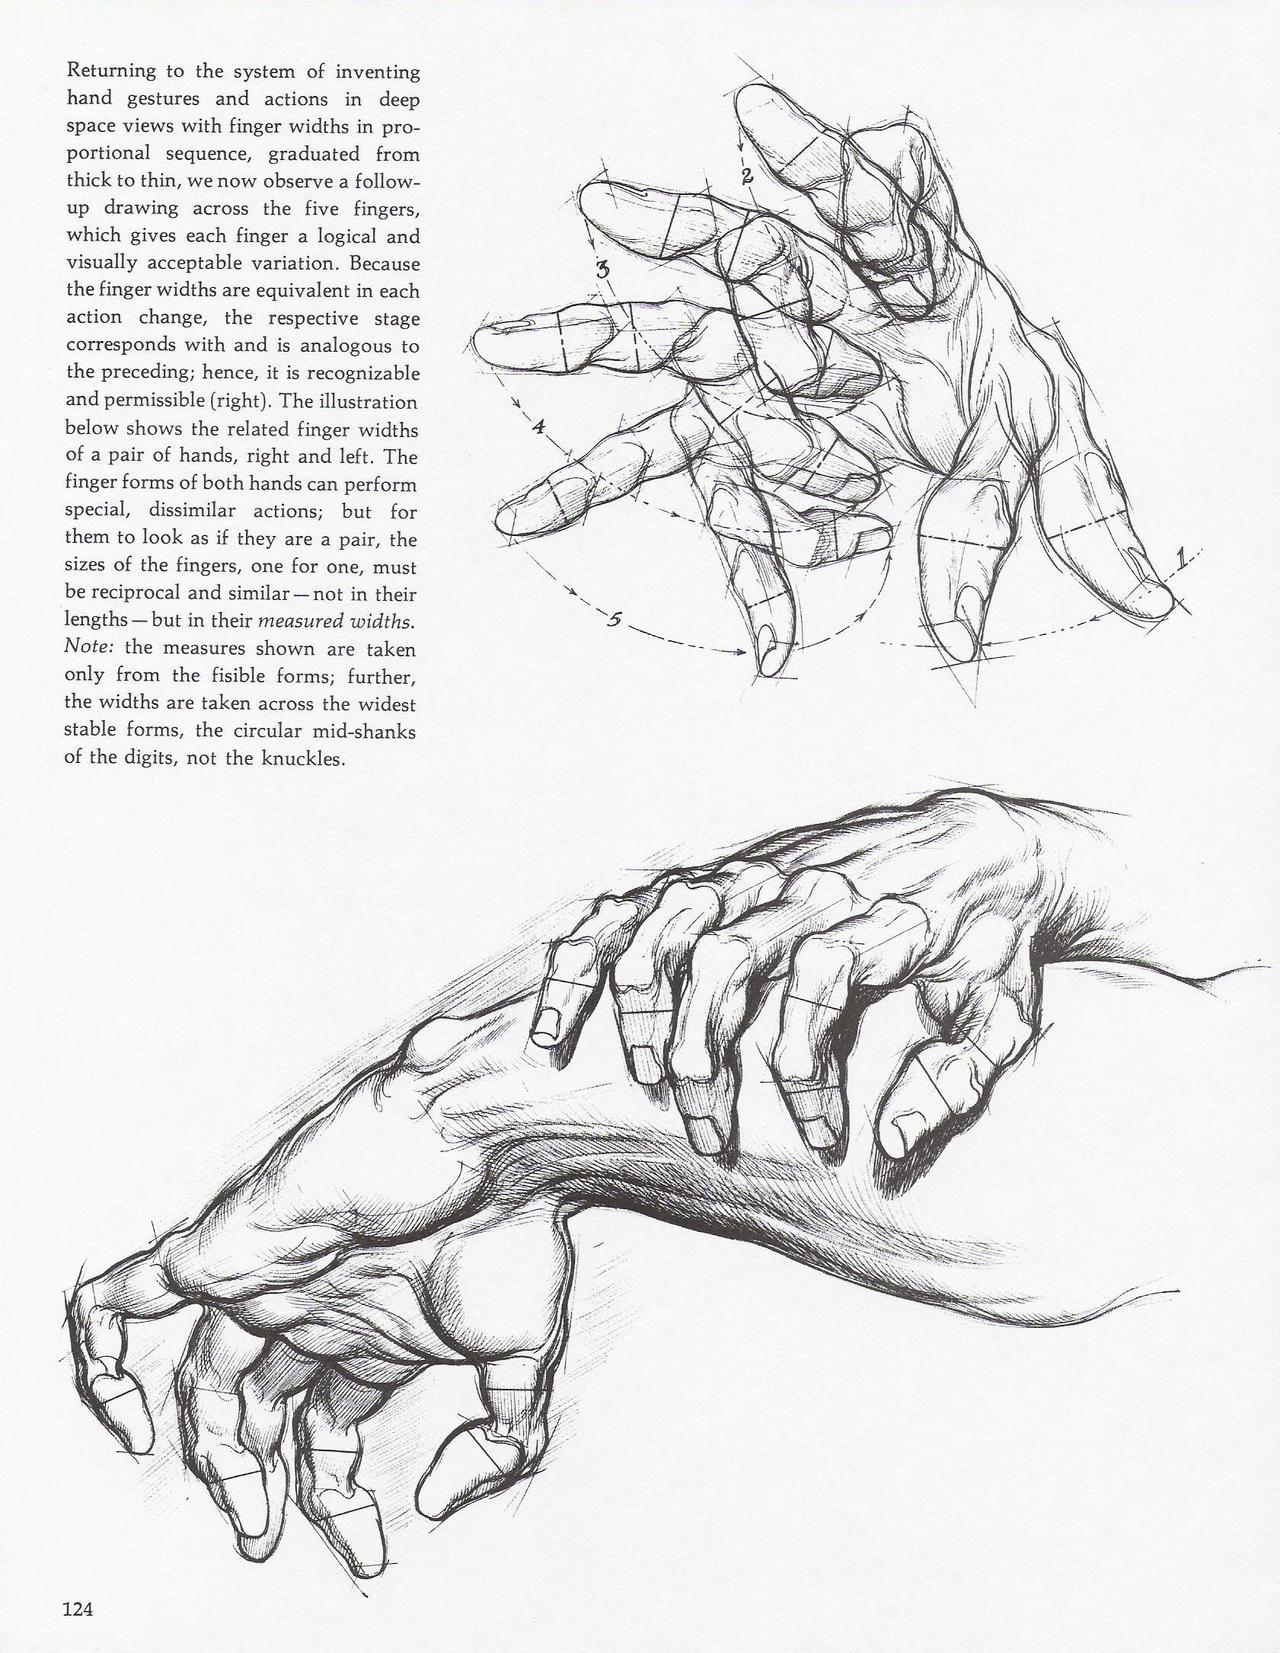 1280x1653 Soullesshusk Confirmed Evil The Hands From Dynamic Figure